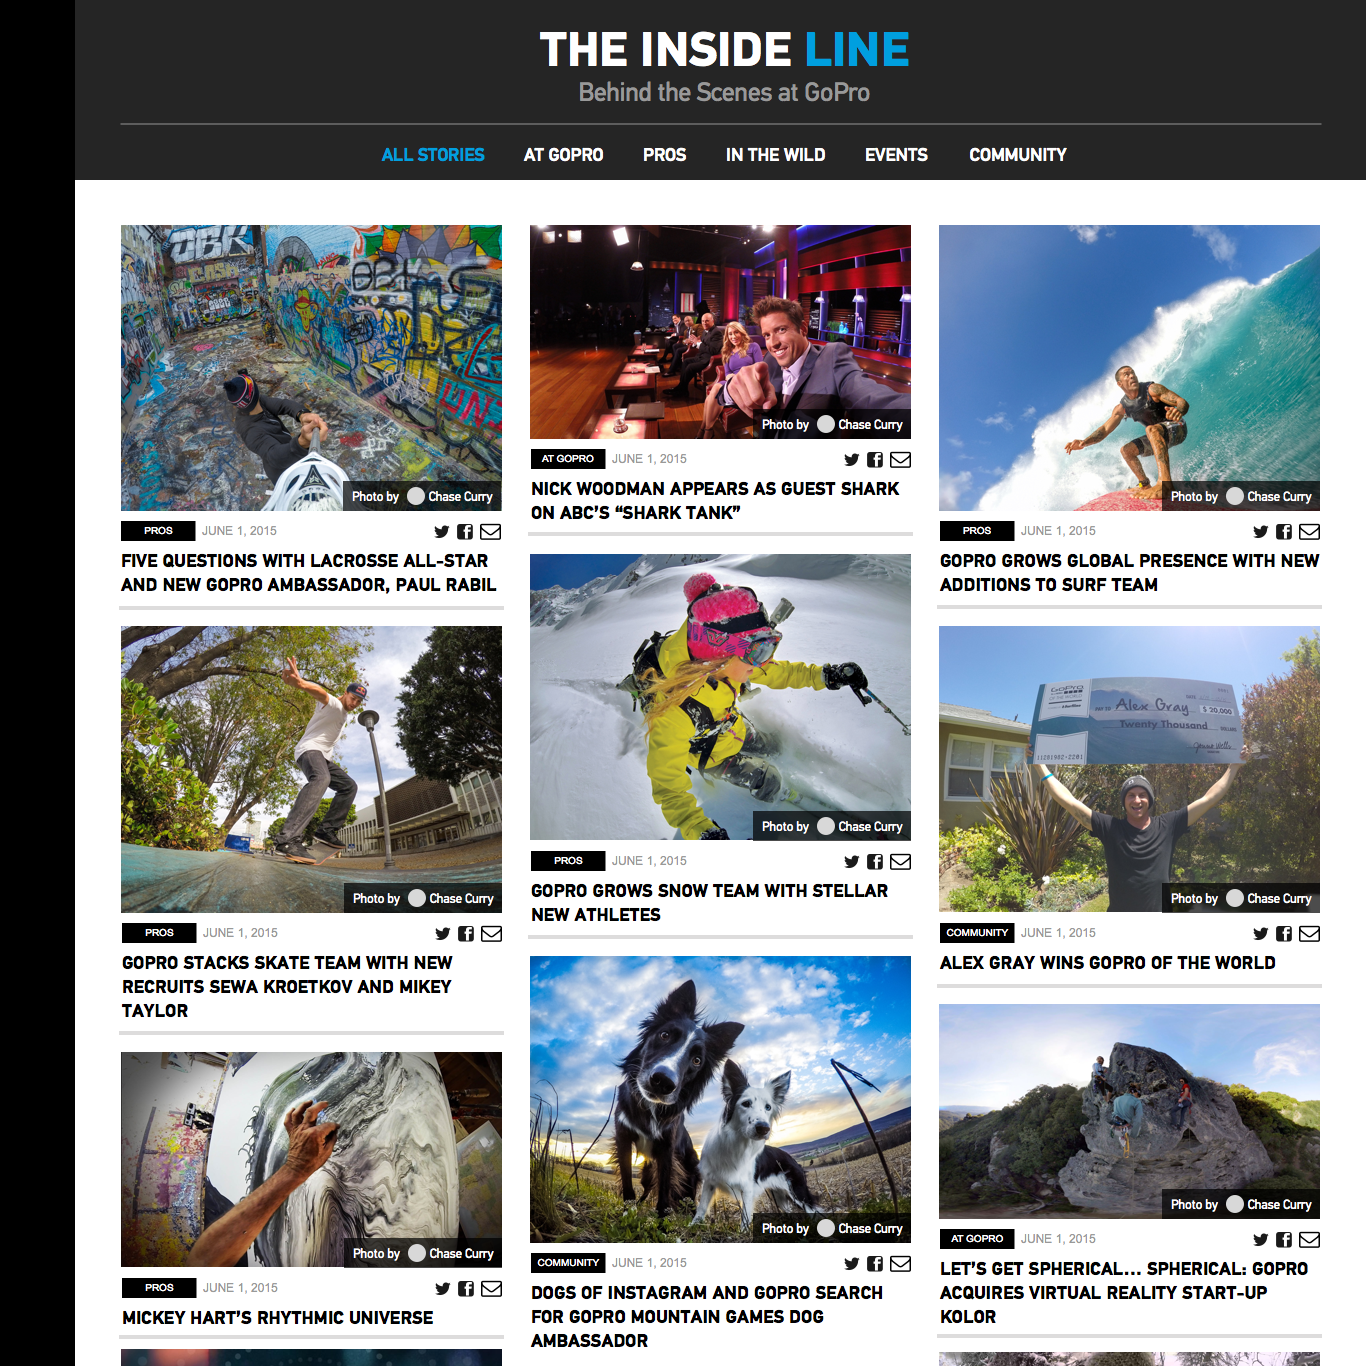 2015: GoPro News Blog (Inside Line) - Article List Visual Exploration